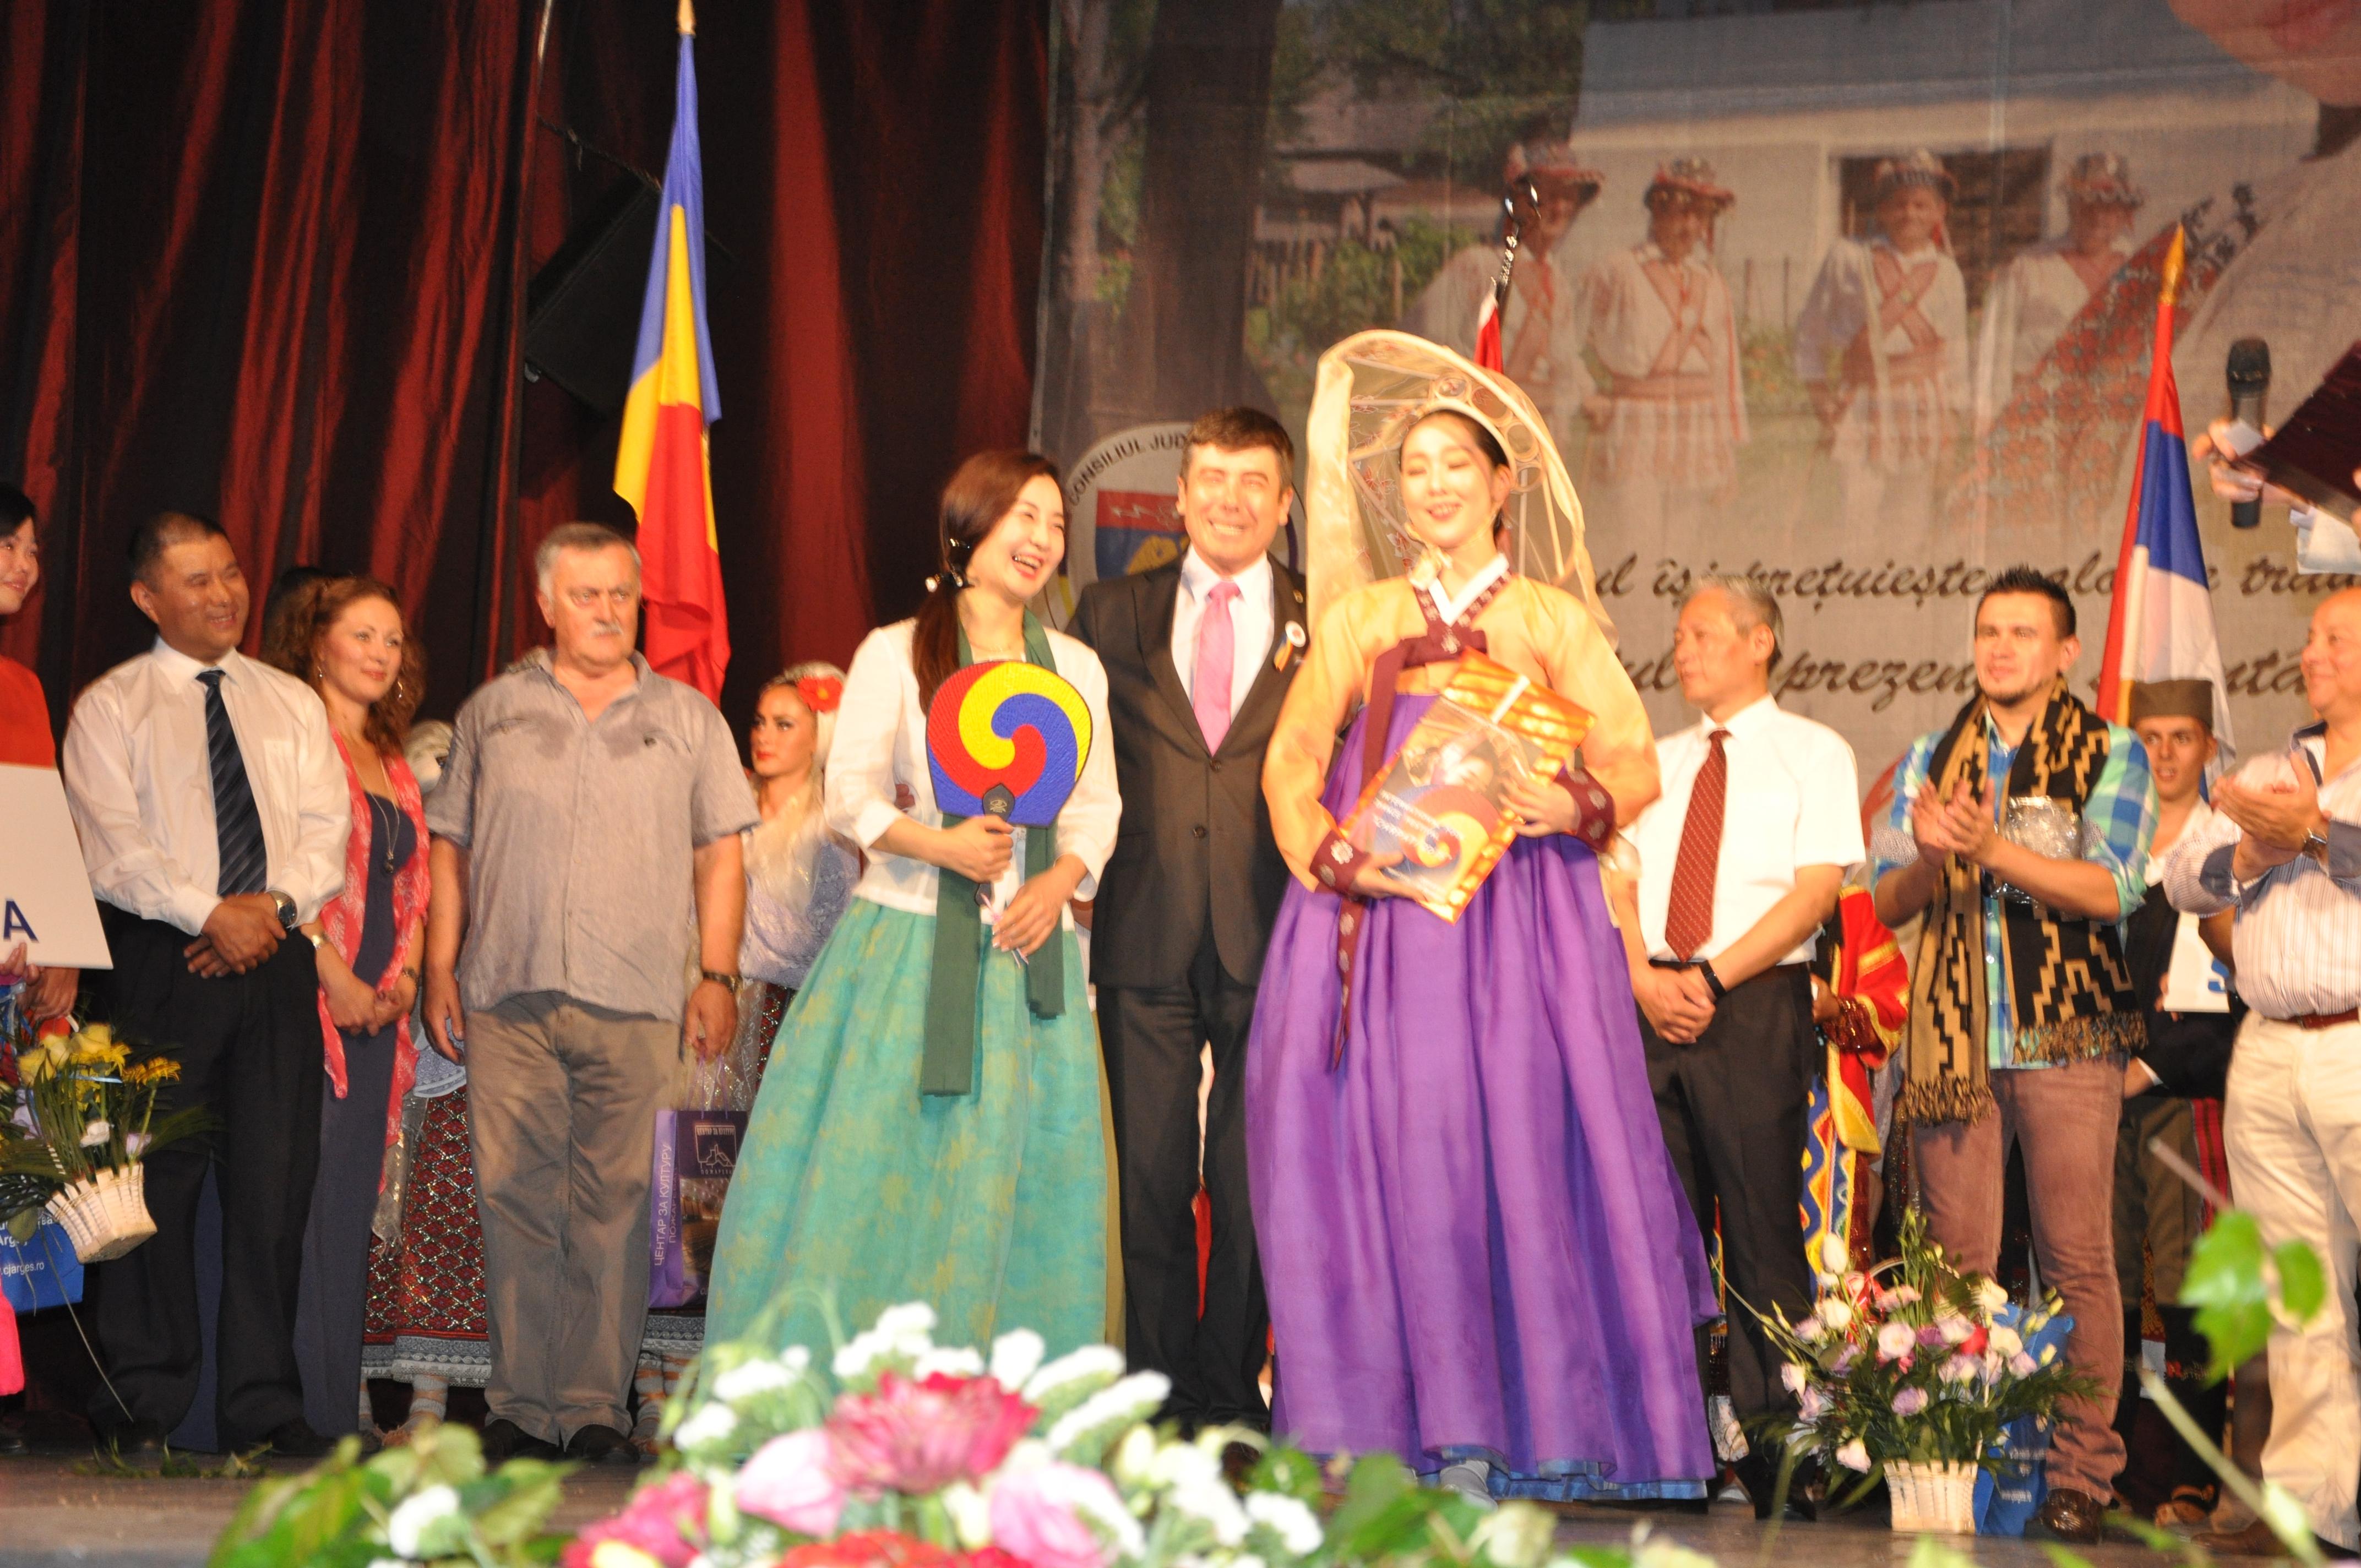 Festivalul International Carpati 2015 (10).JPG